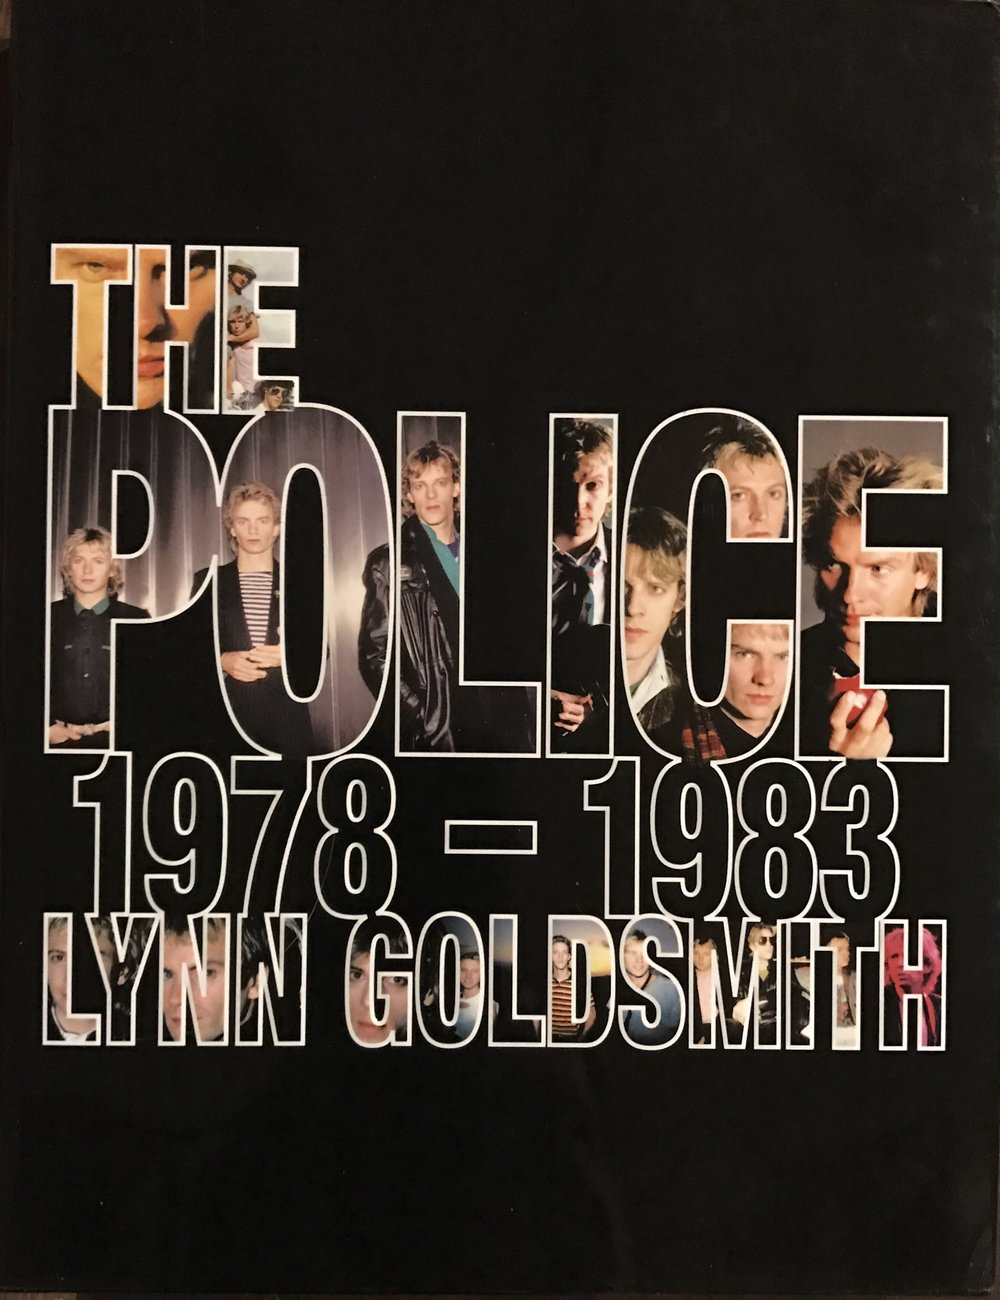 ilonBook_LynnGoldsmith_ThePolice.jpg